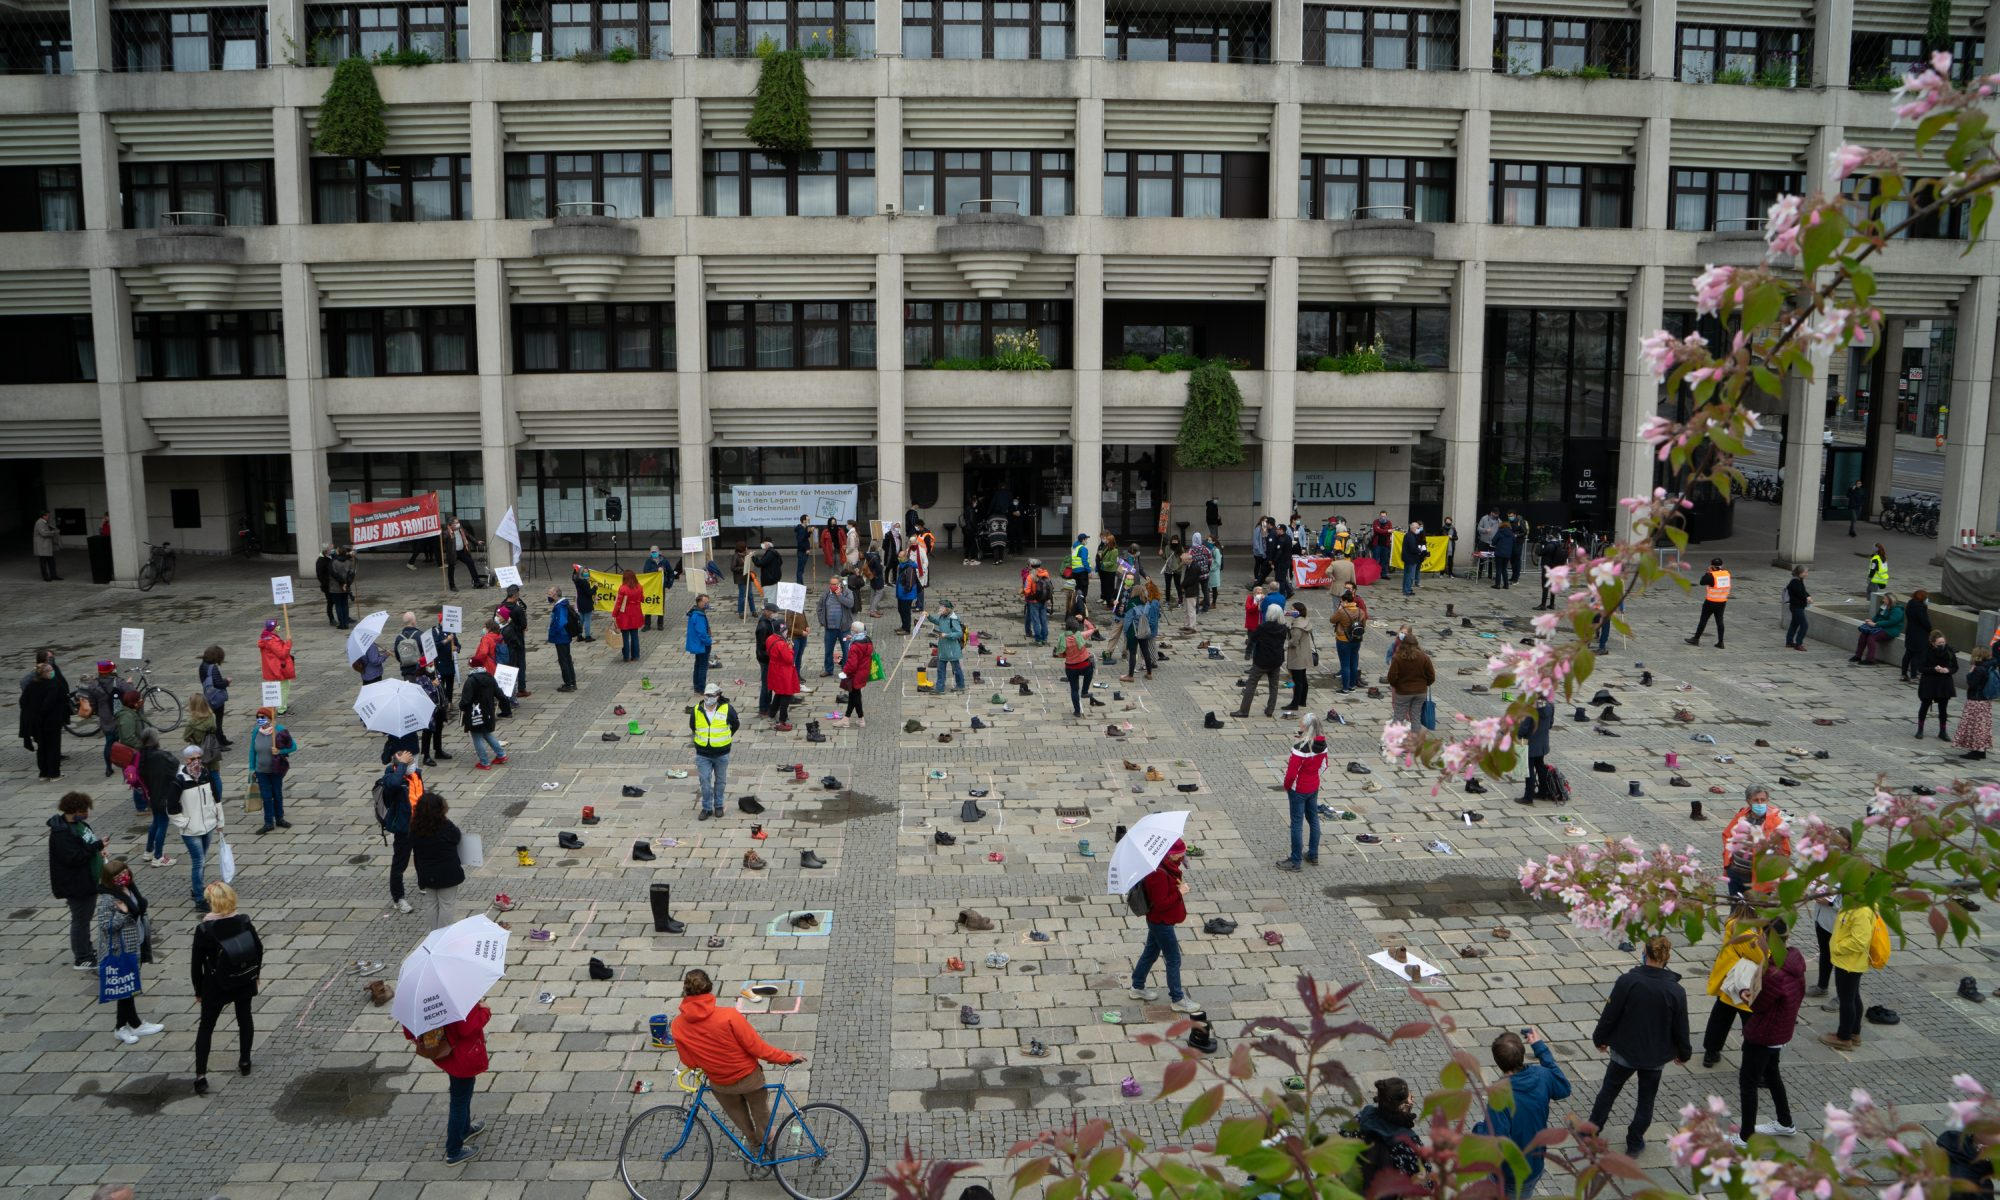 Umbrella March Linz - Internationaler Tag des Flüchtlings #withrefugees